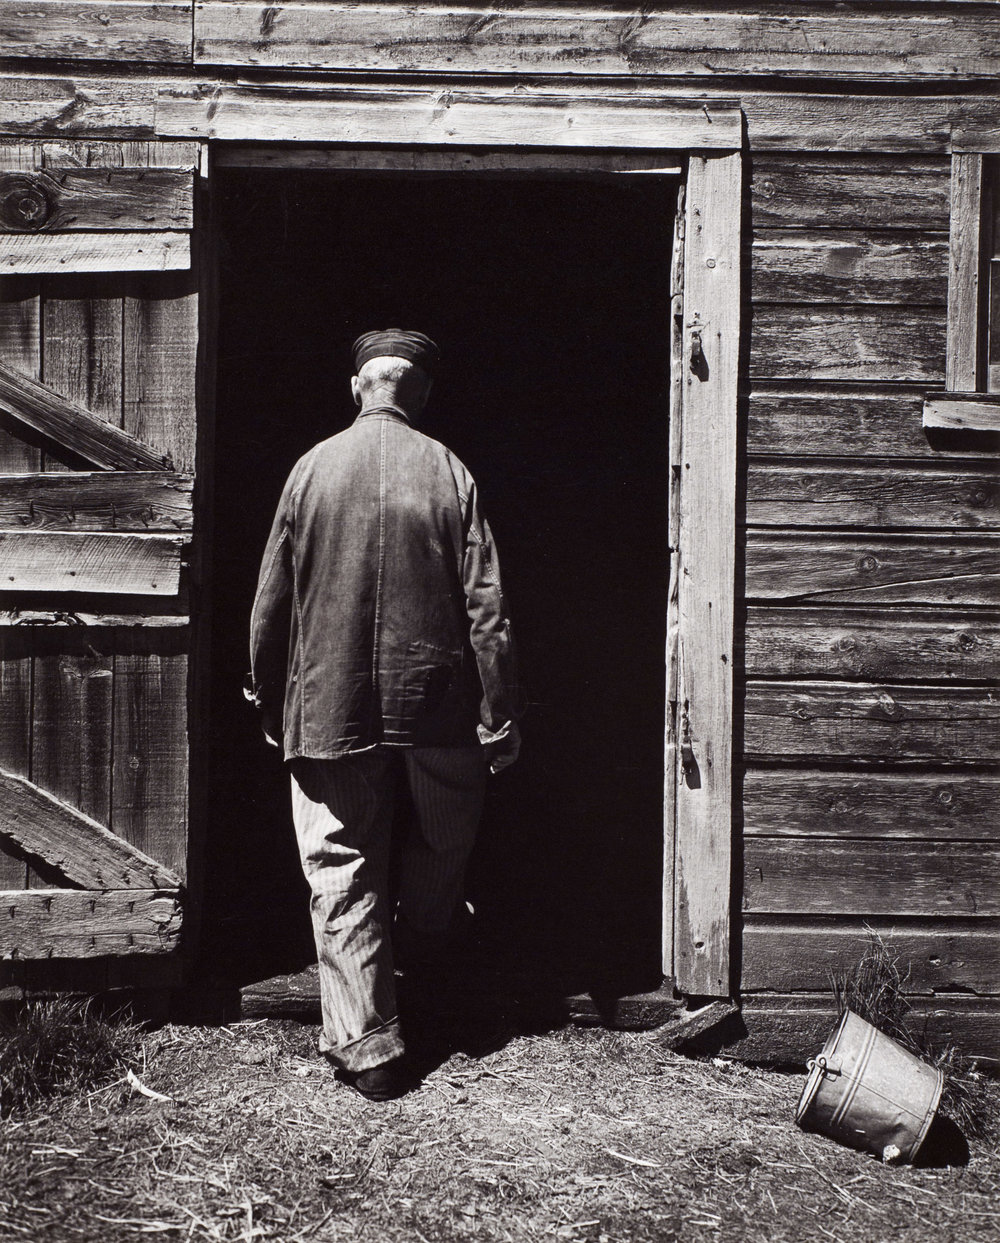 Wright+Morris+Uncle+Harry+Entering+the+Barn.jpg